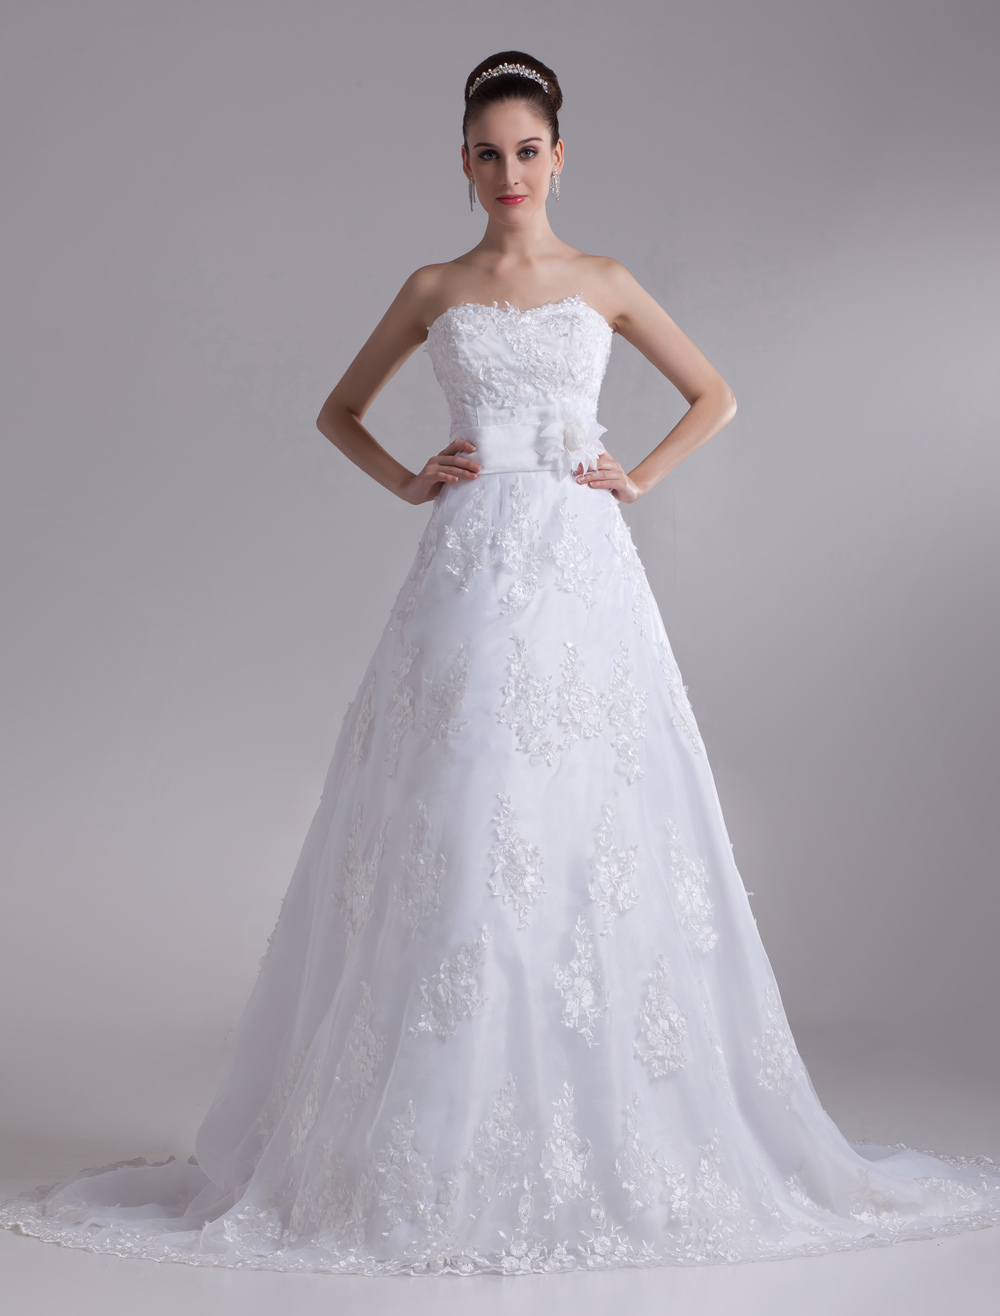 White Brides Wedding Dress with Court Train (Cheap Wedding Dress) photo